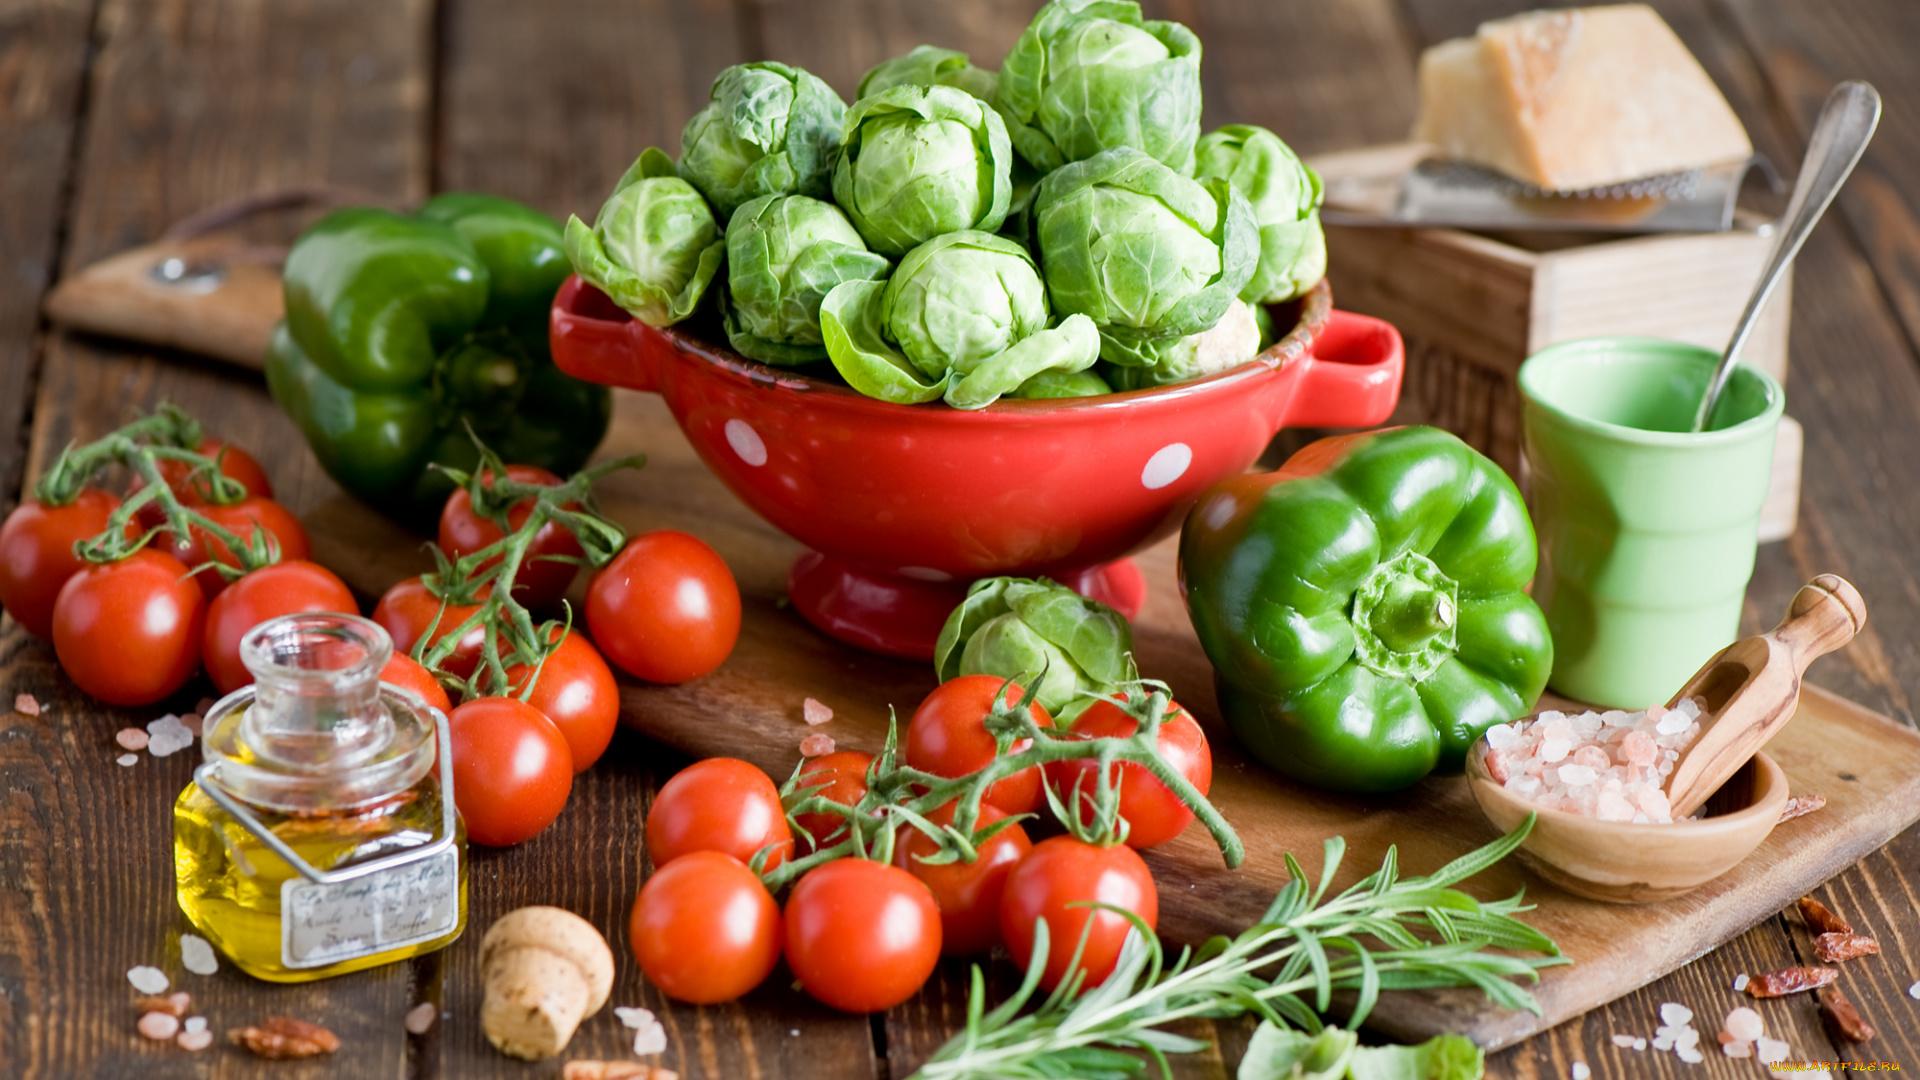 eda-ovoschi-rozmarin-pomidory-perec-brok